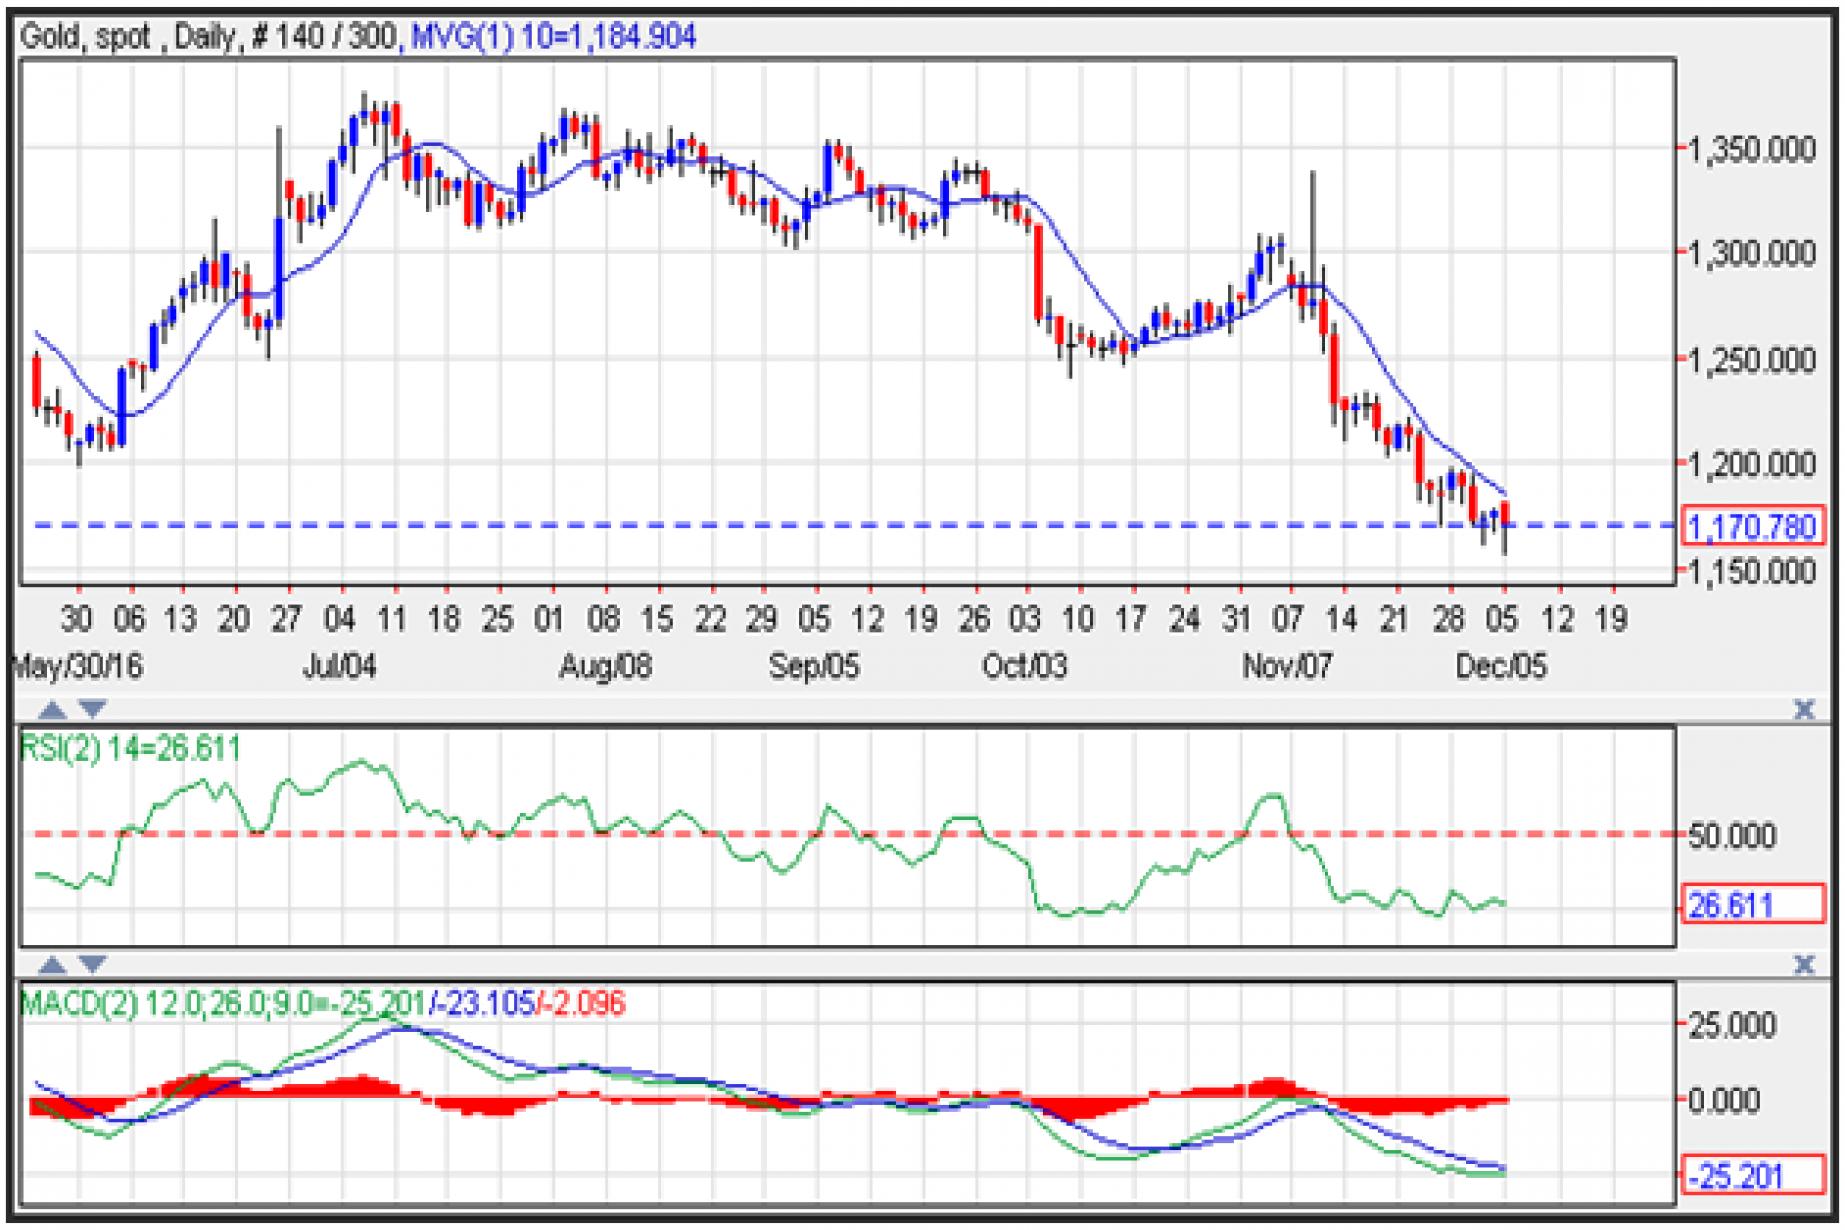 Gold Price Prediction For December 6 2016